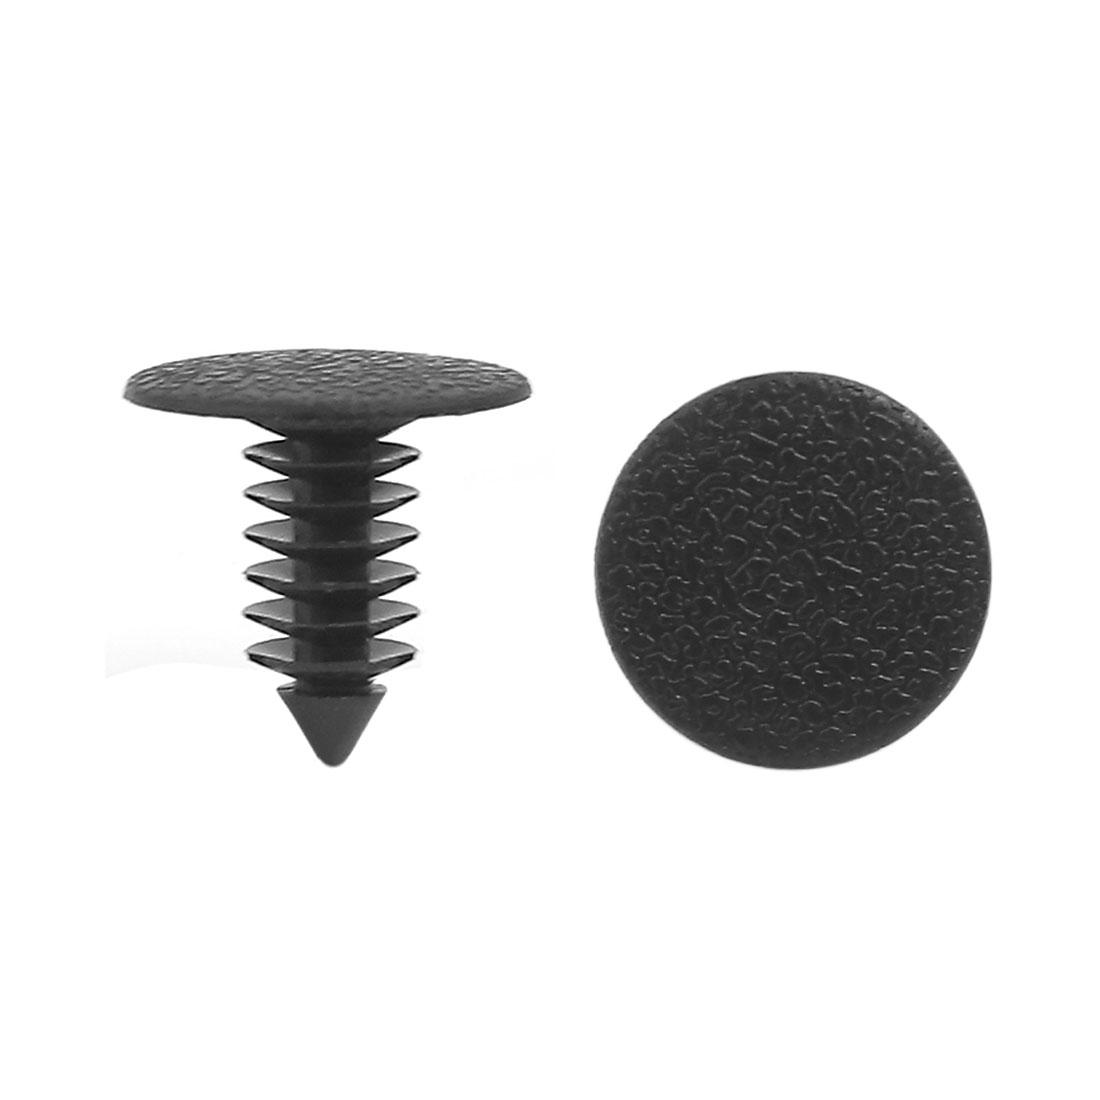 100PCS 9mm Hole Plastic Push in Rivet Panel Fixings Clips for Car Auto Vehicle